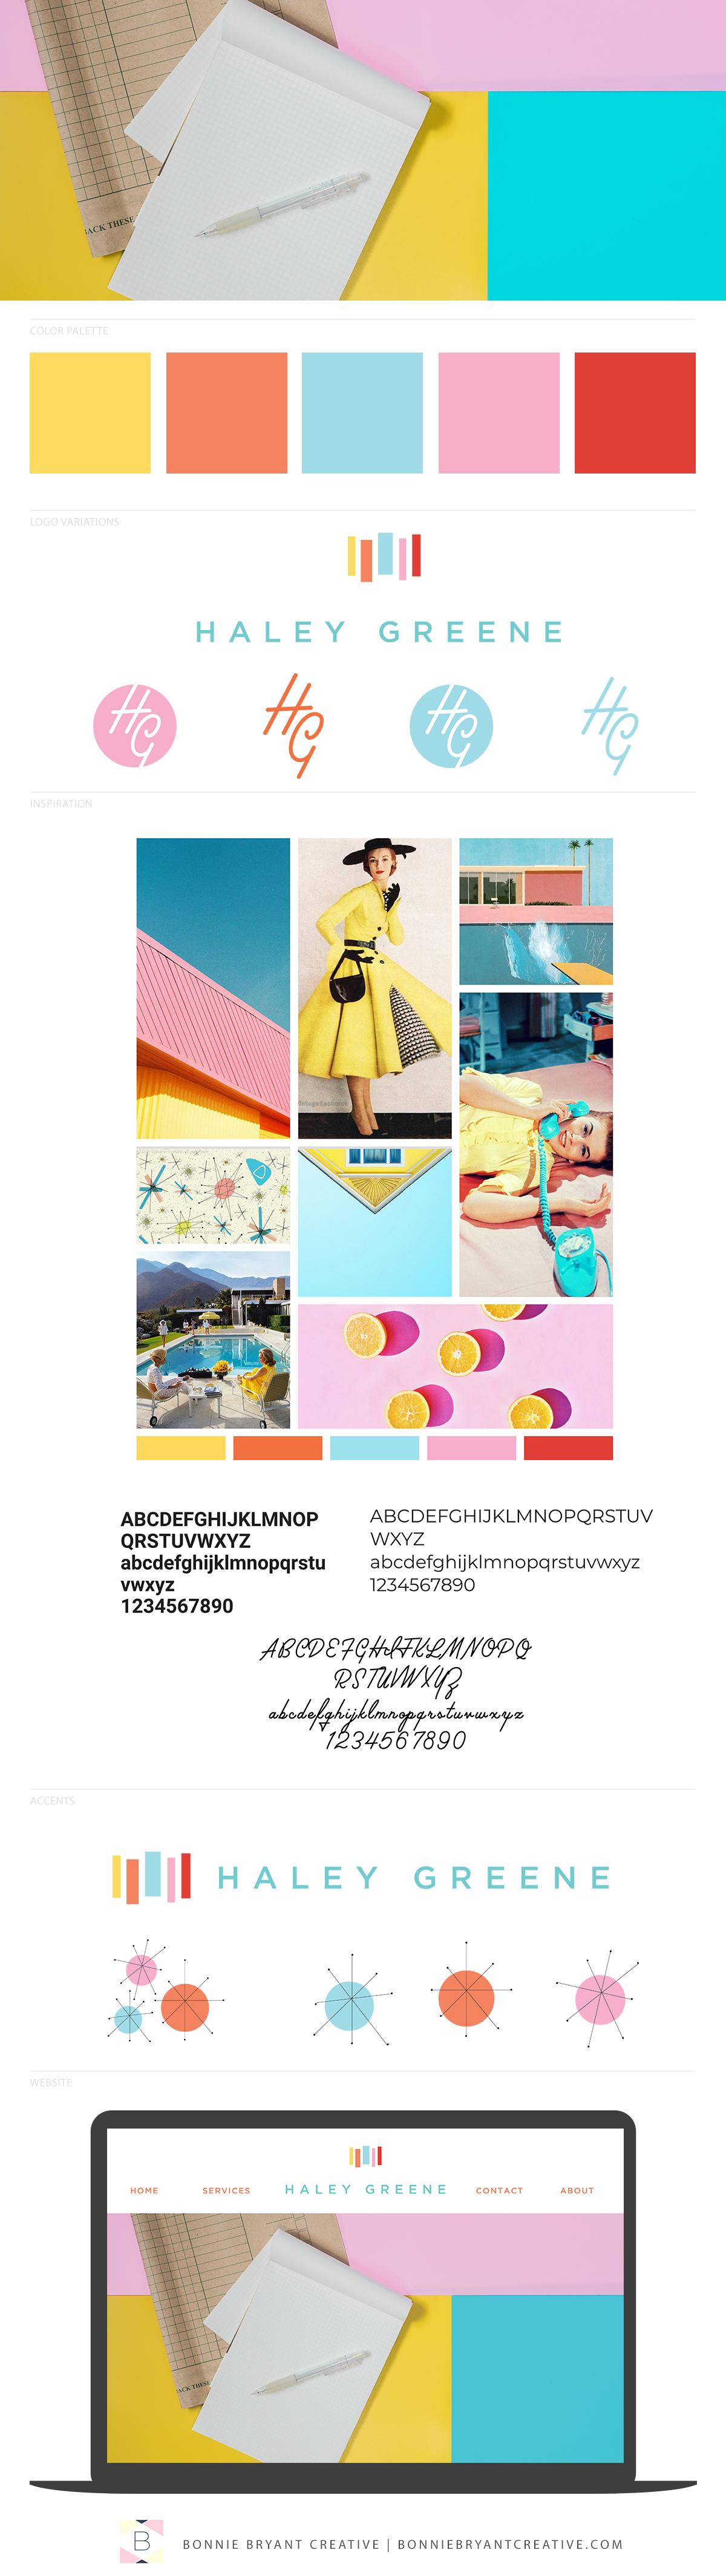 brand design for digital marketing agency | marketing agency brand design